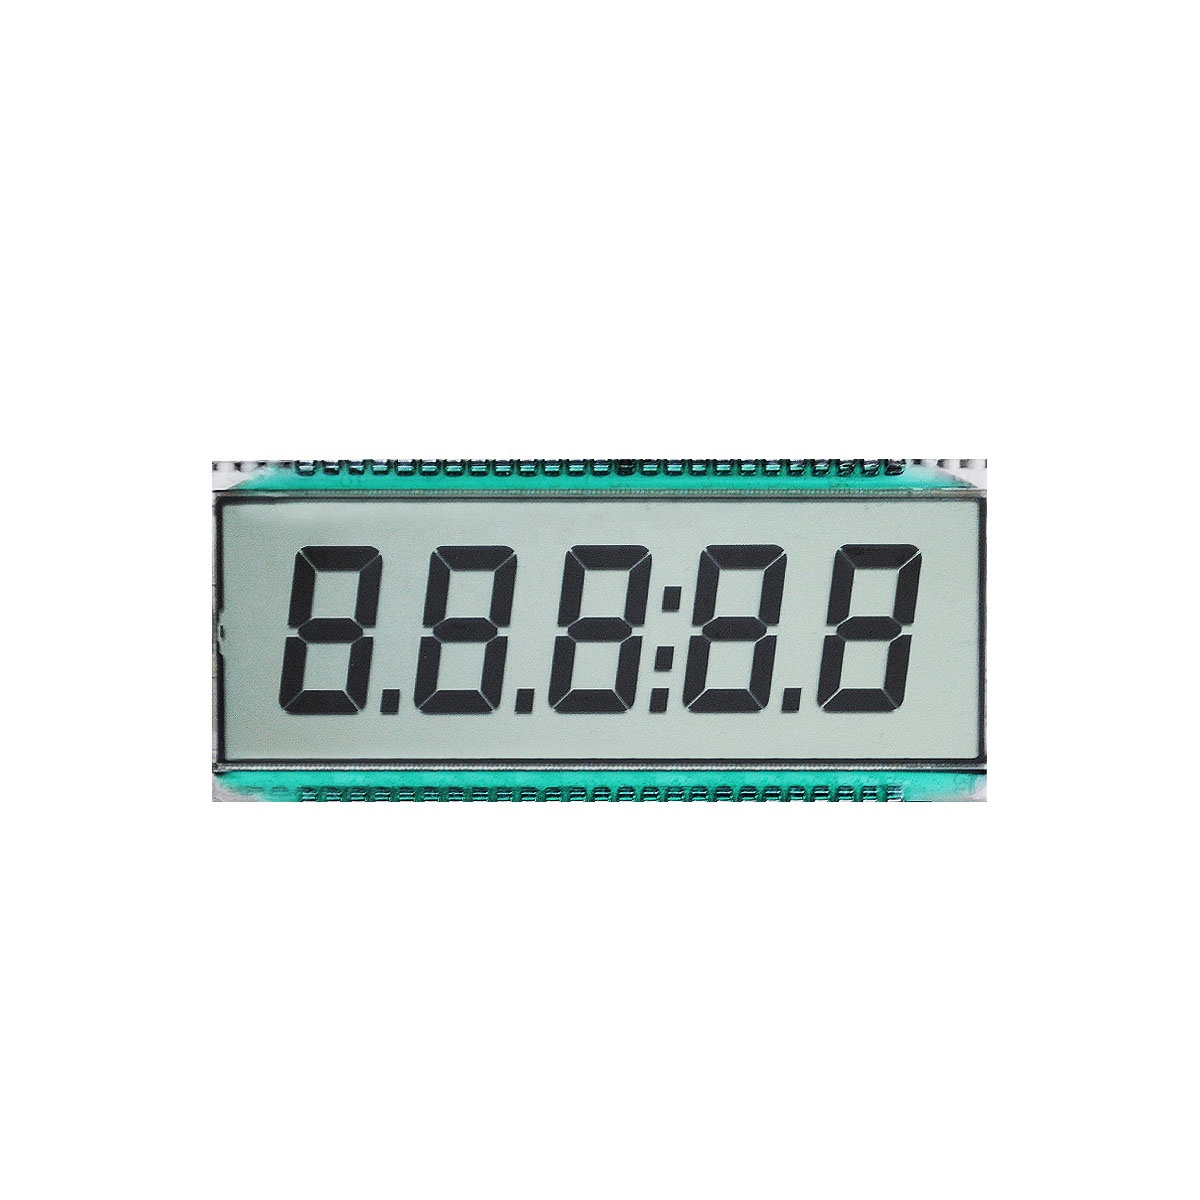 5 haneli 12 'saat TN LCD Panel segmentli lcd ekran GDC03828 -20 ~ 70C